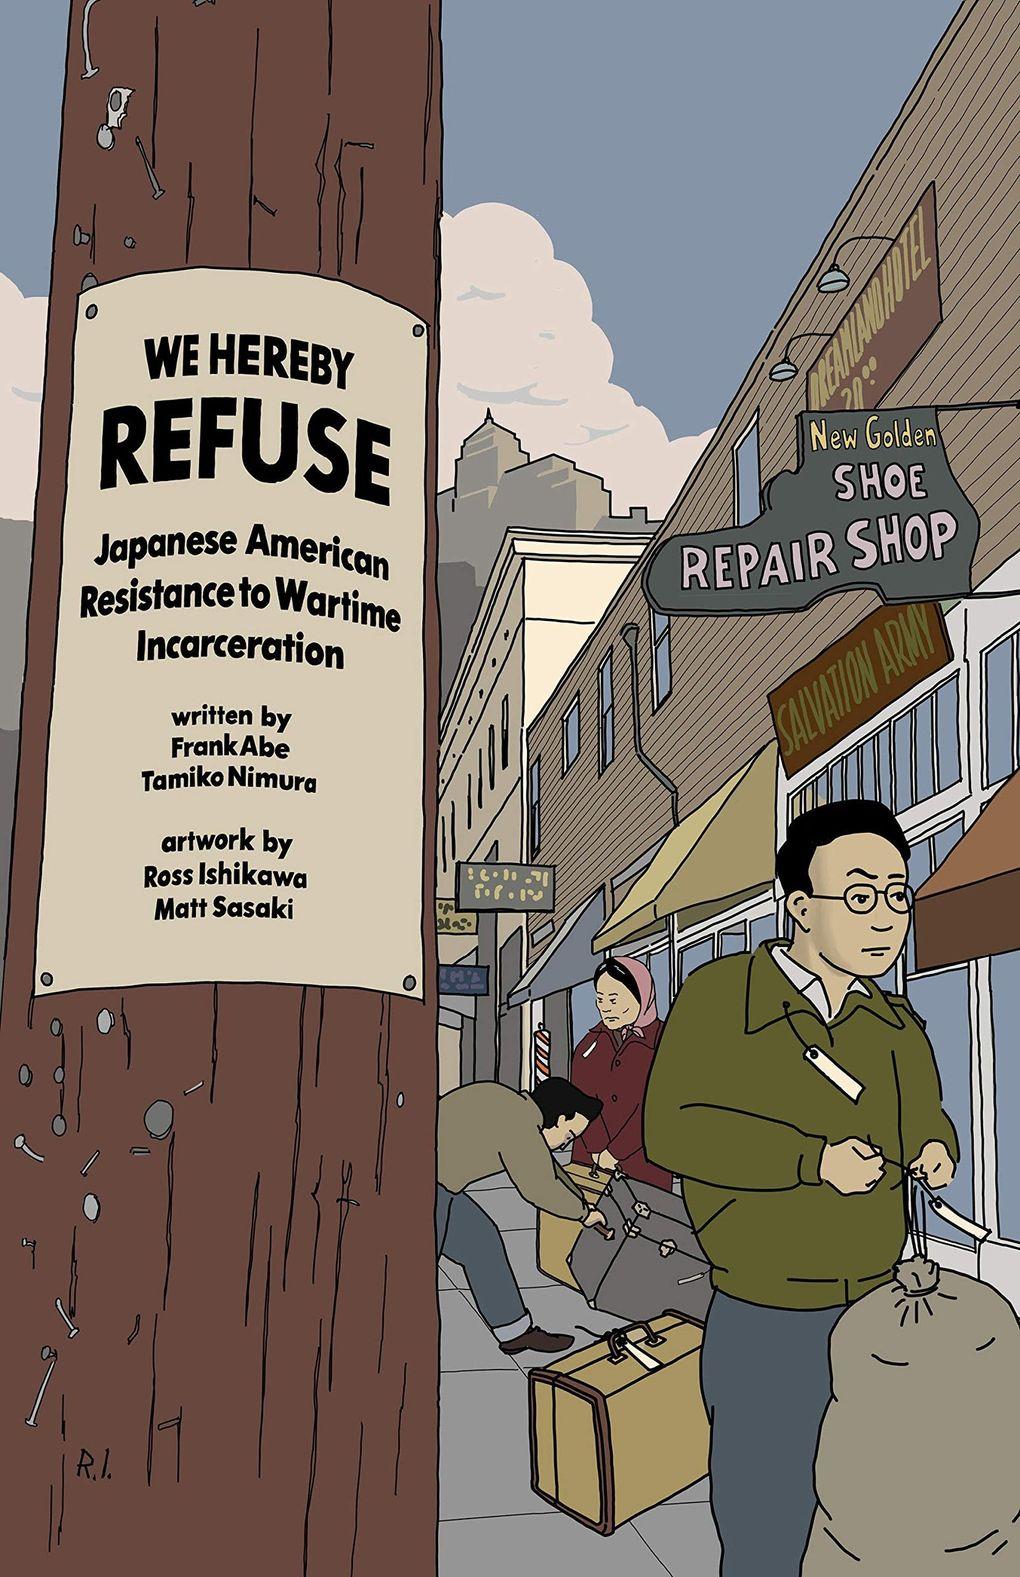 """We Hereby Refuse: Japanese American Resistance to Wartime Incarceration"" by Frank Abe and Tamiko Nimura. Illustrated by Ross Ishikawa and Matt Sasaki. (Chin Music Press)"